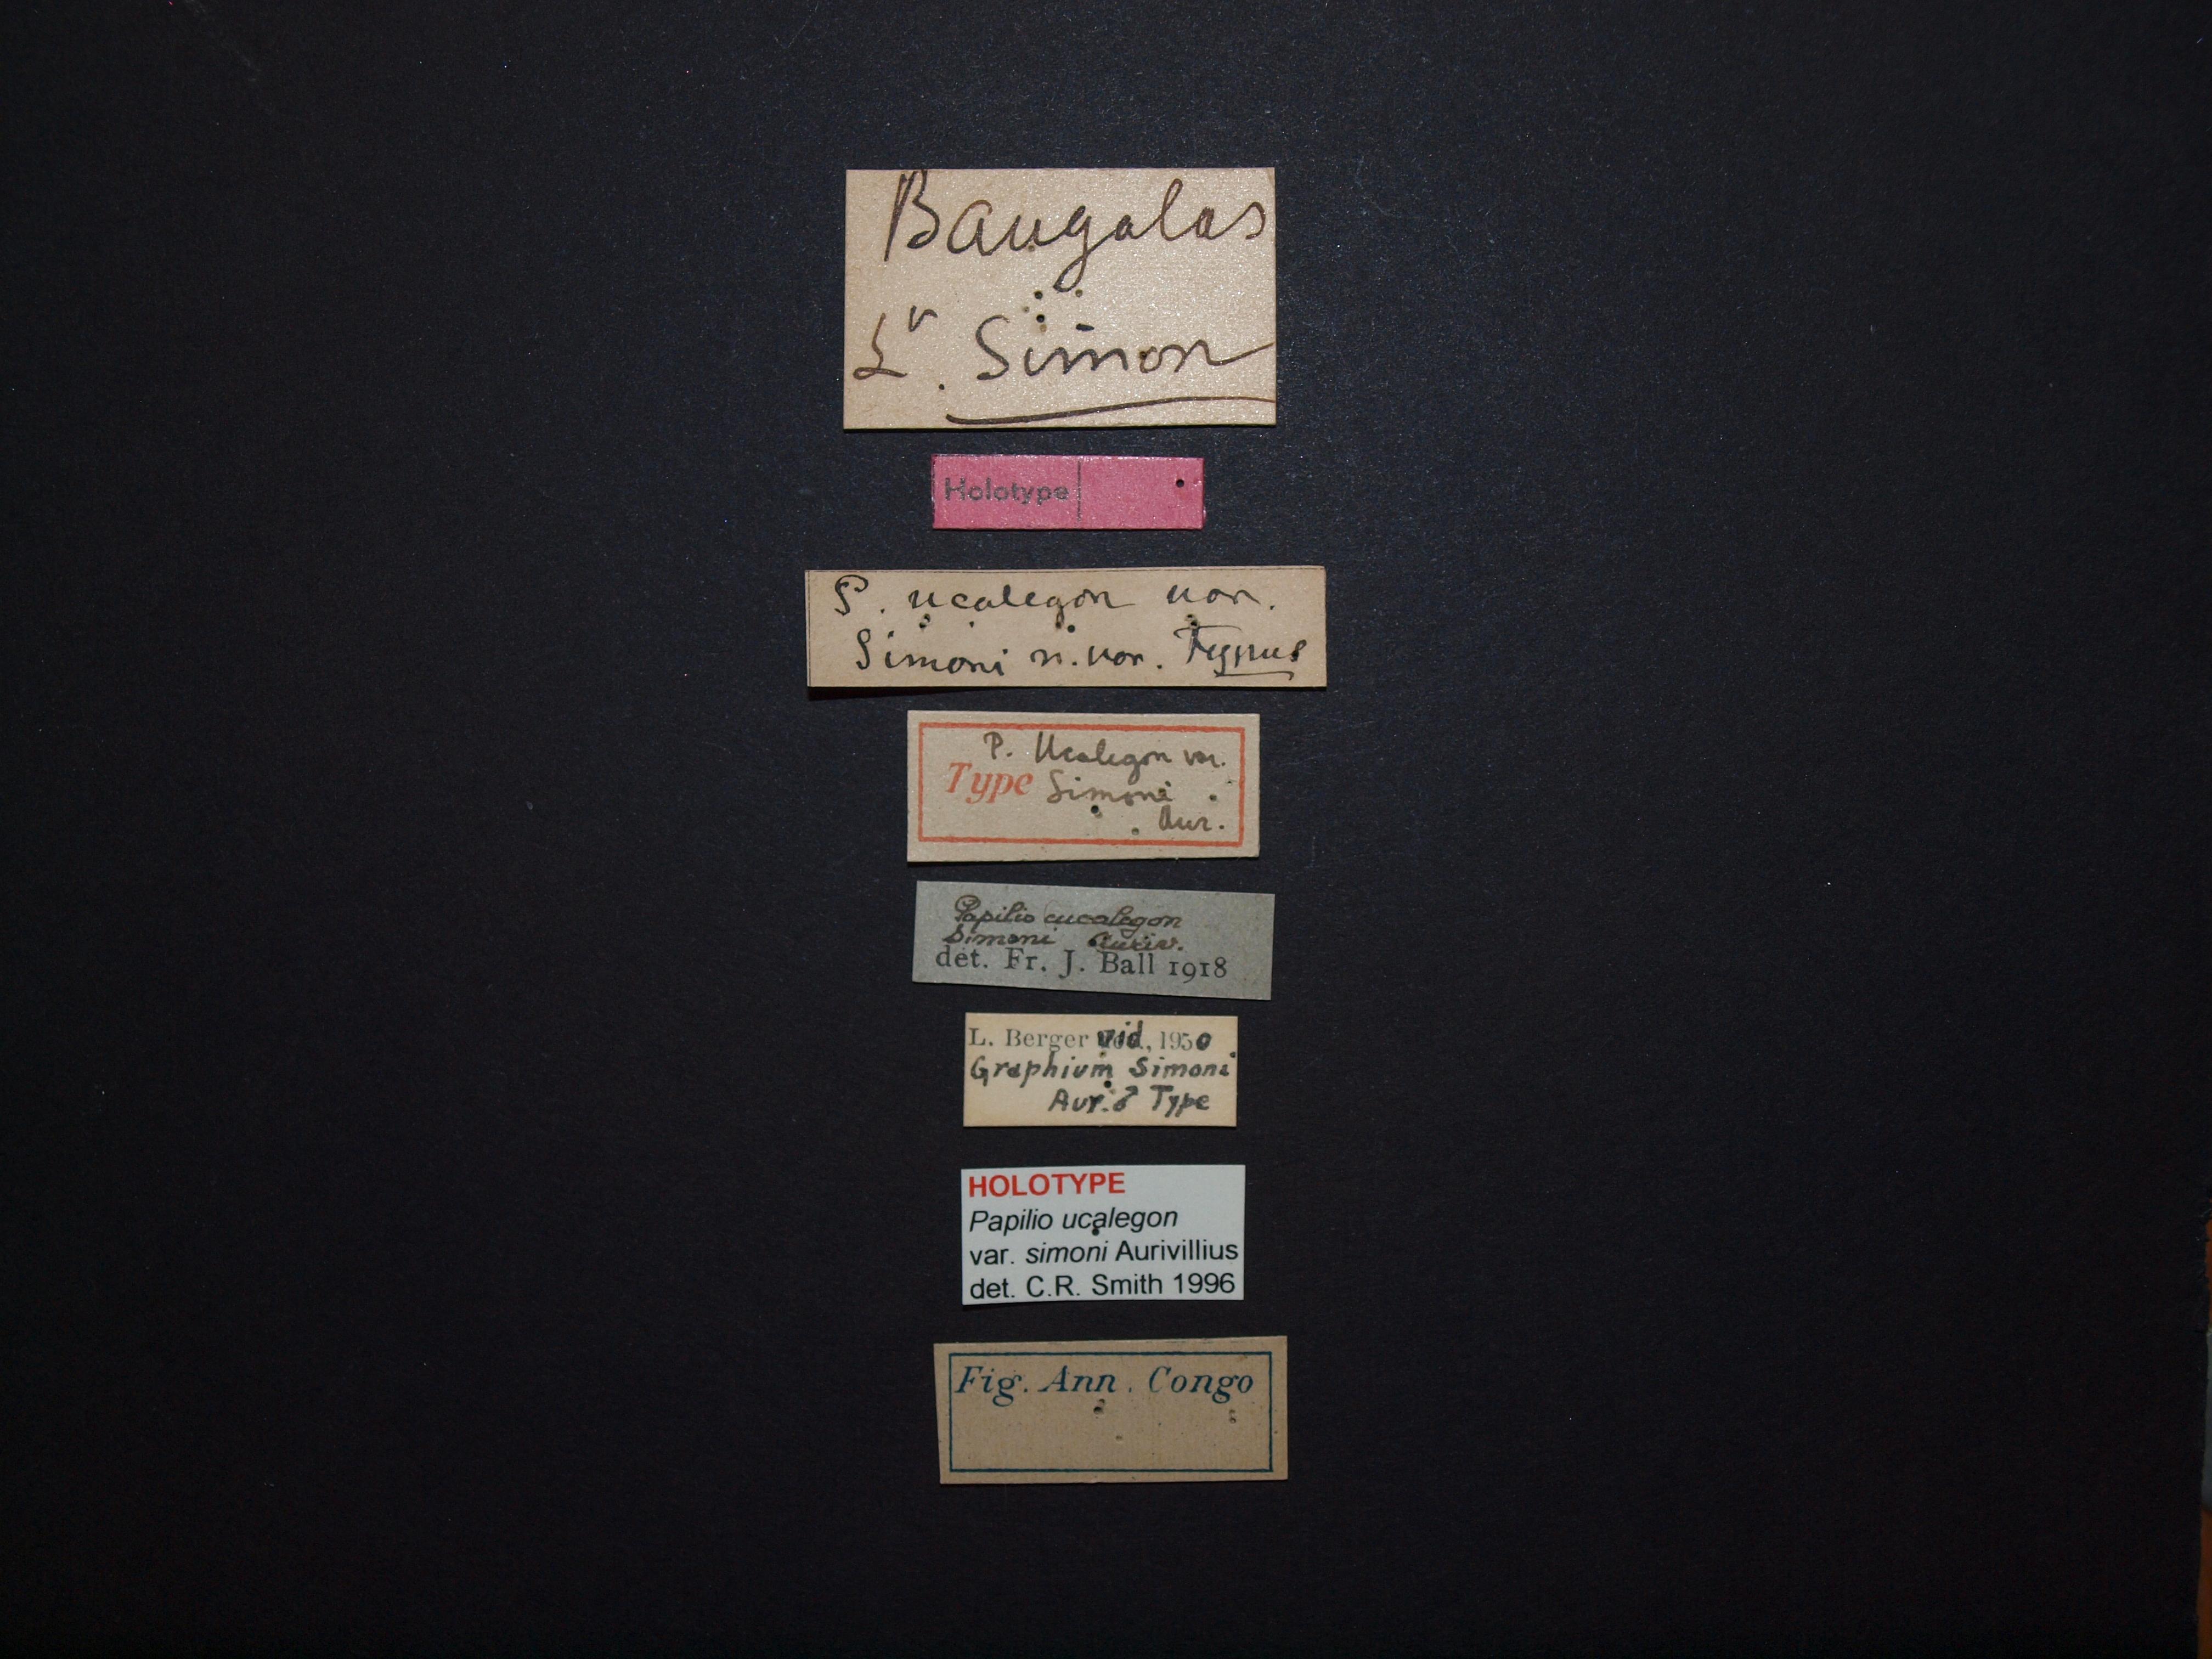 Papilio ucalegon var simoni M ht Labels.JPG